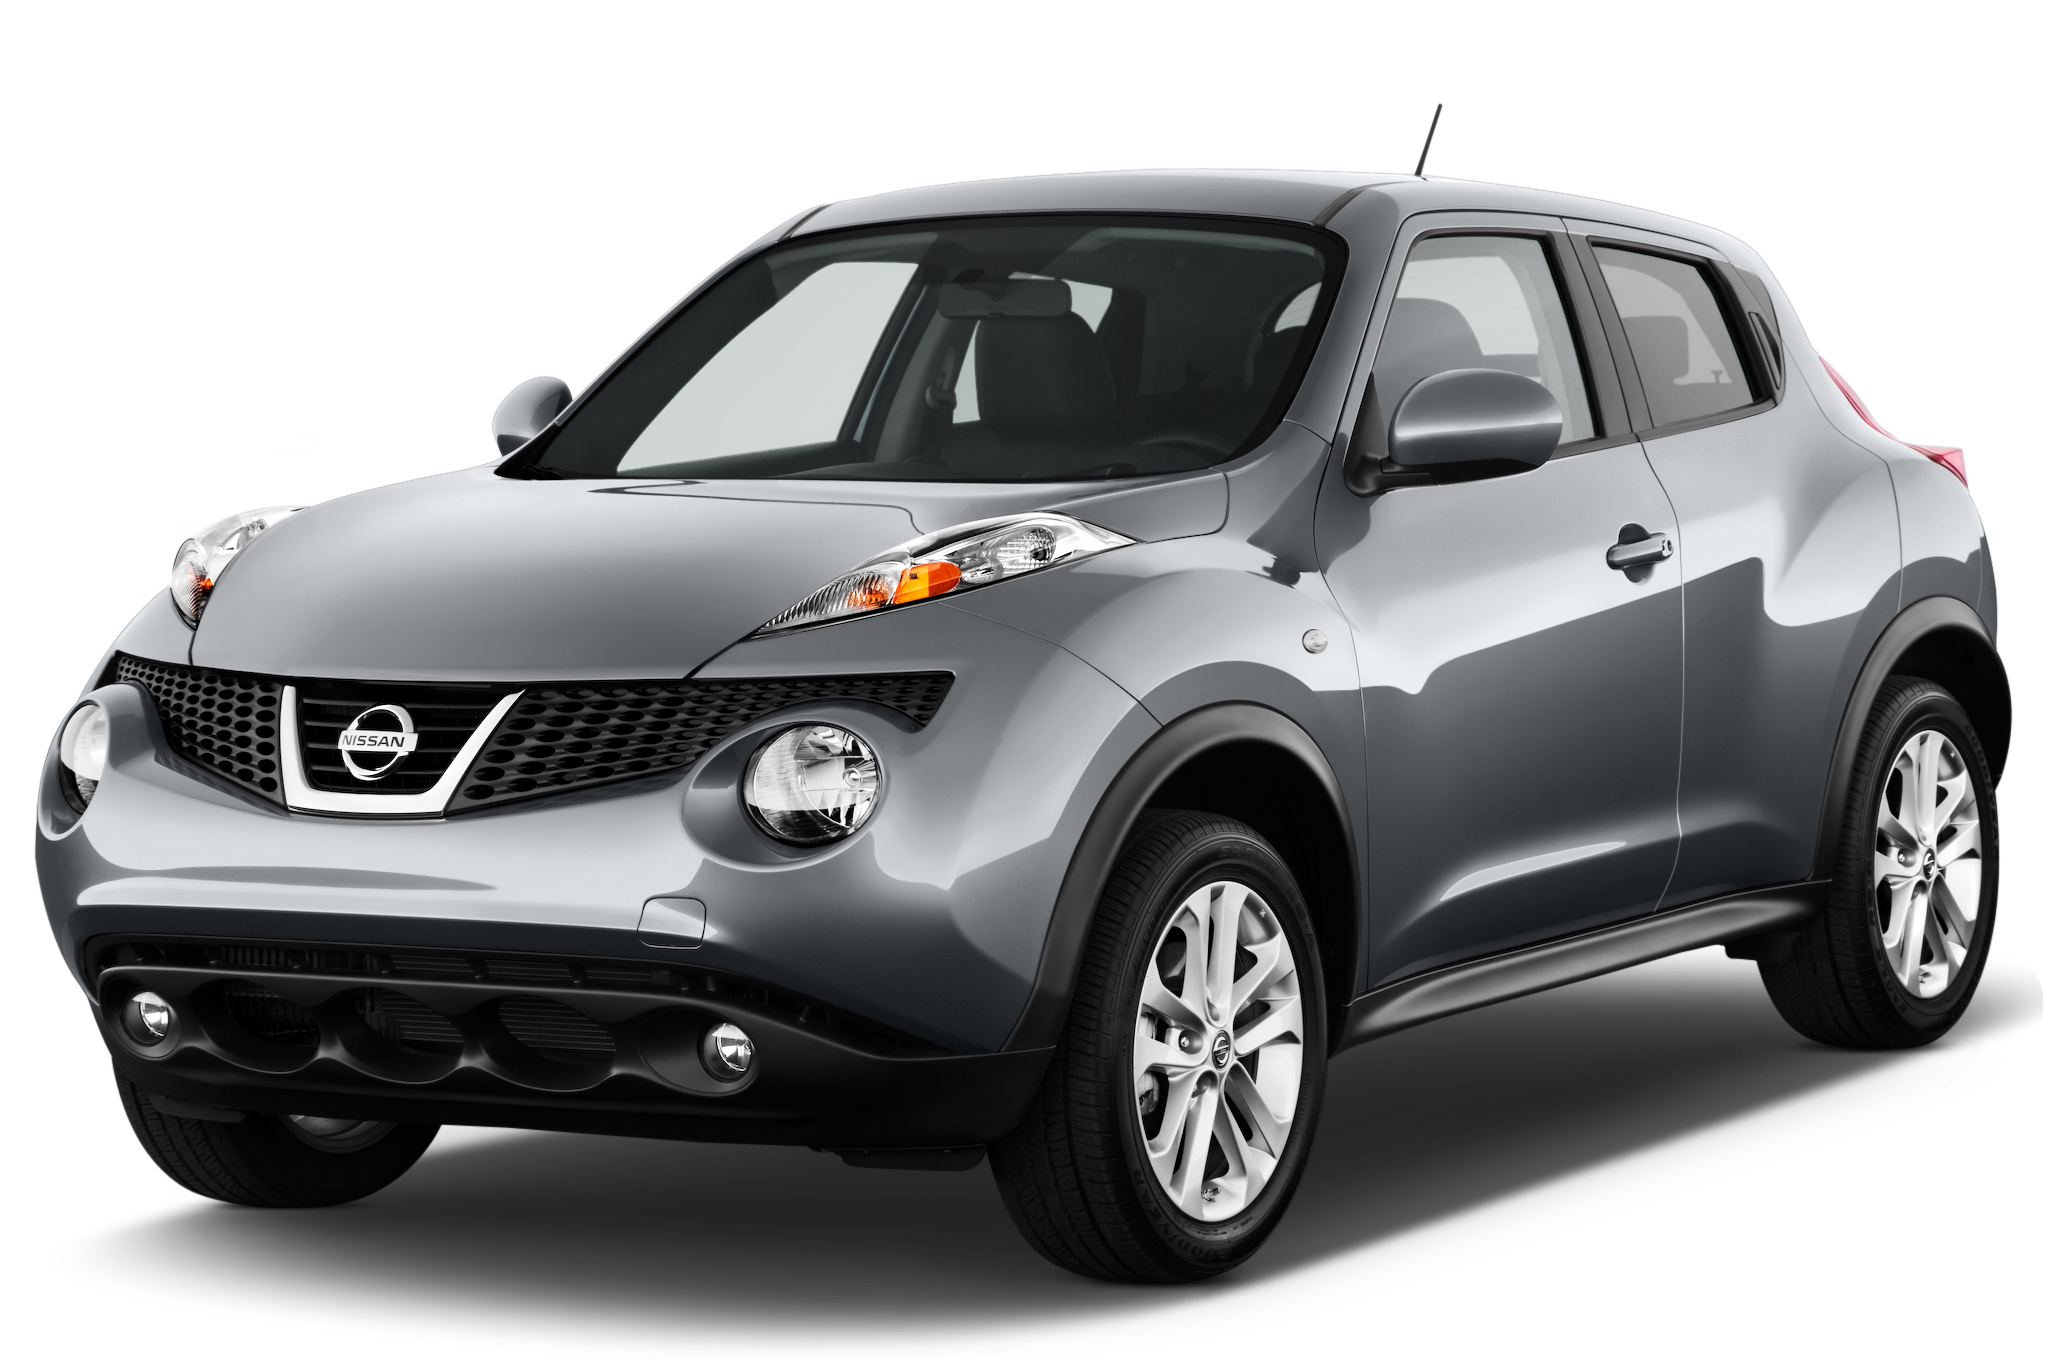 Image Gallery Nissan Juke 201 4